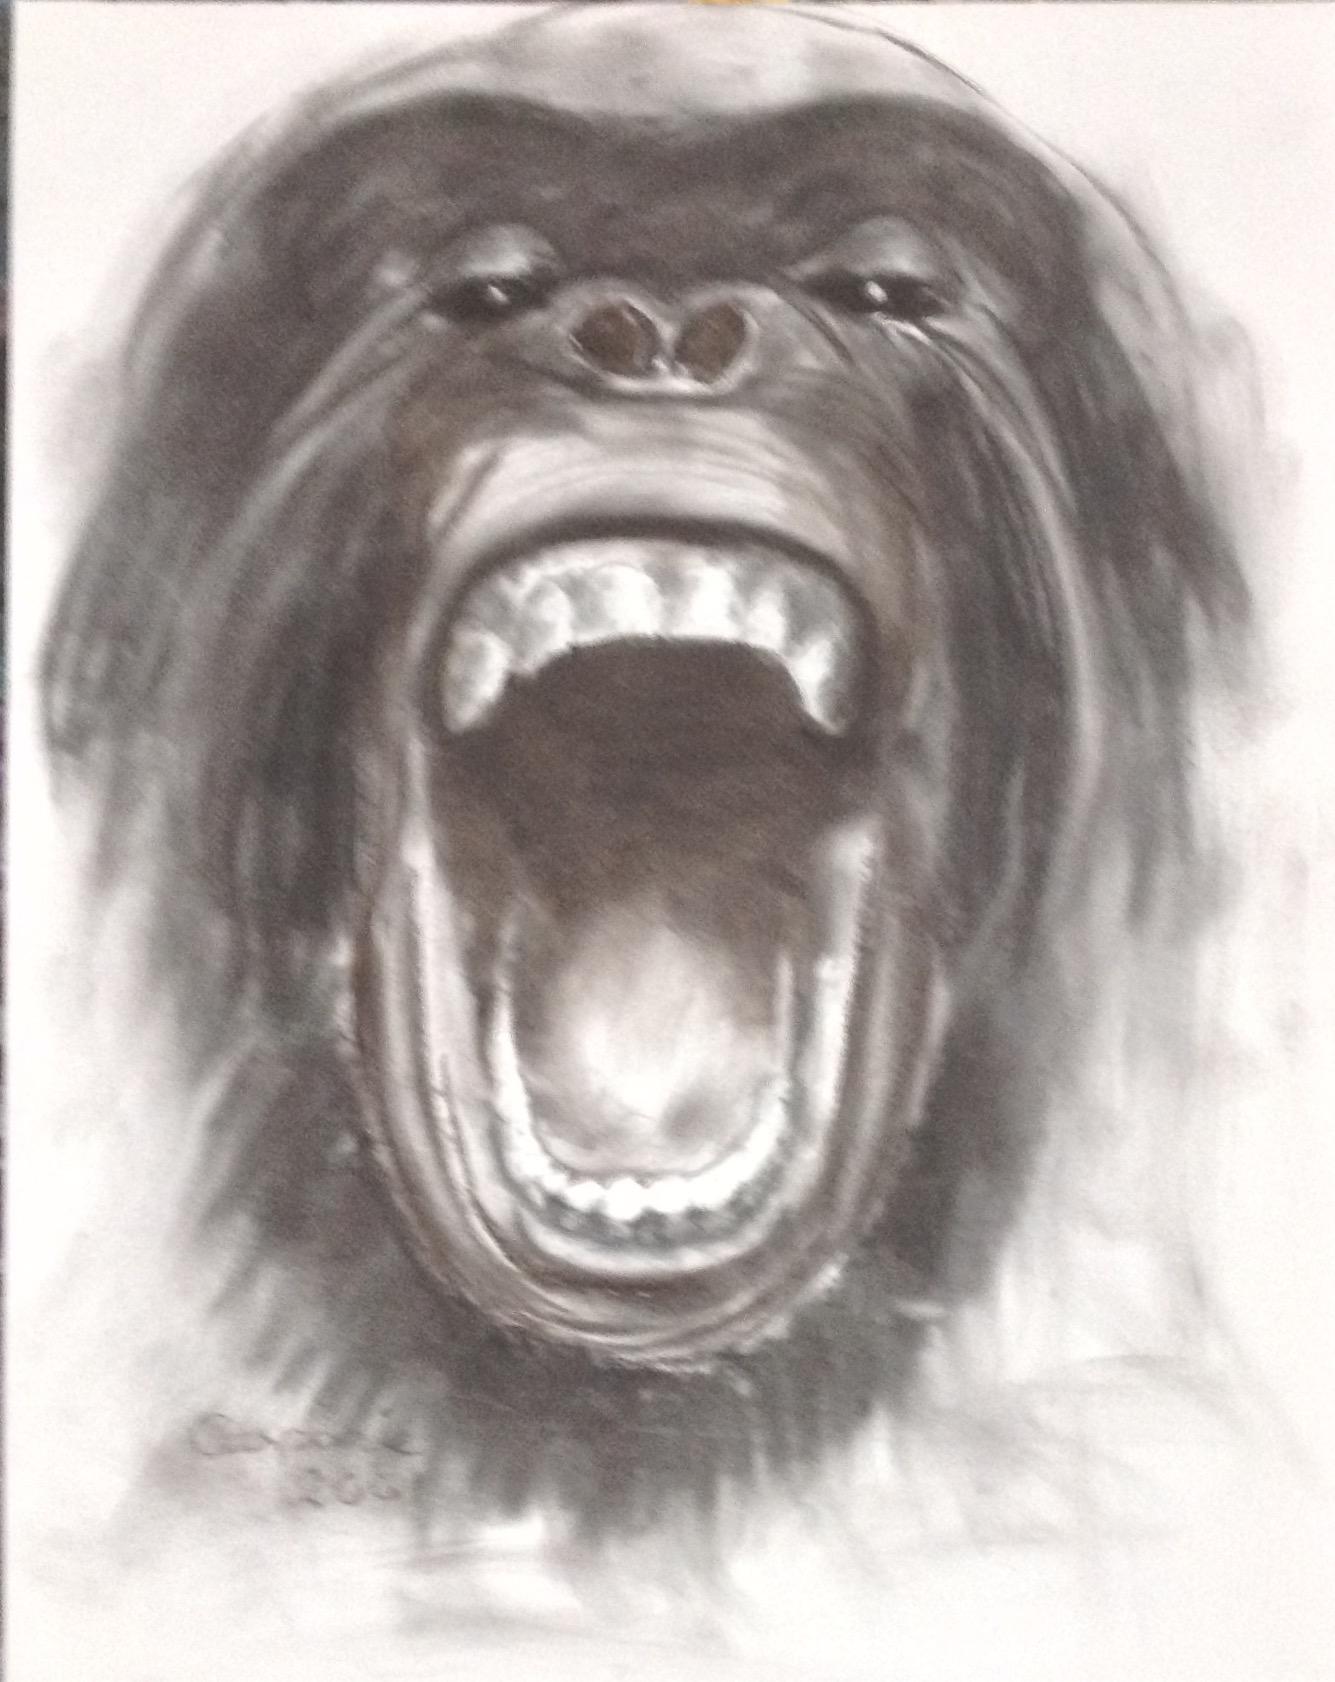 Gorilla, Houtskool op papier, A2 formaat